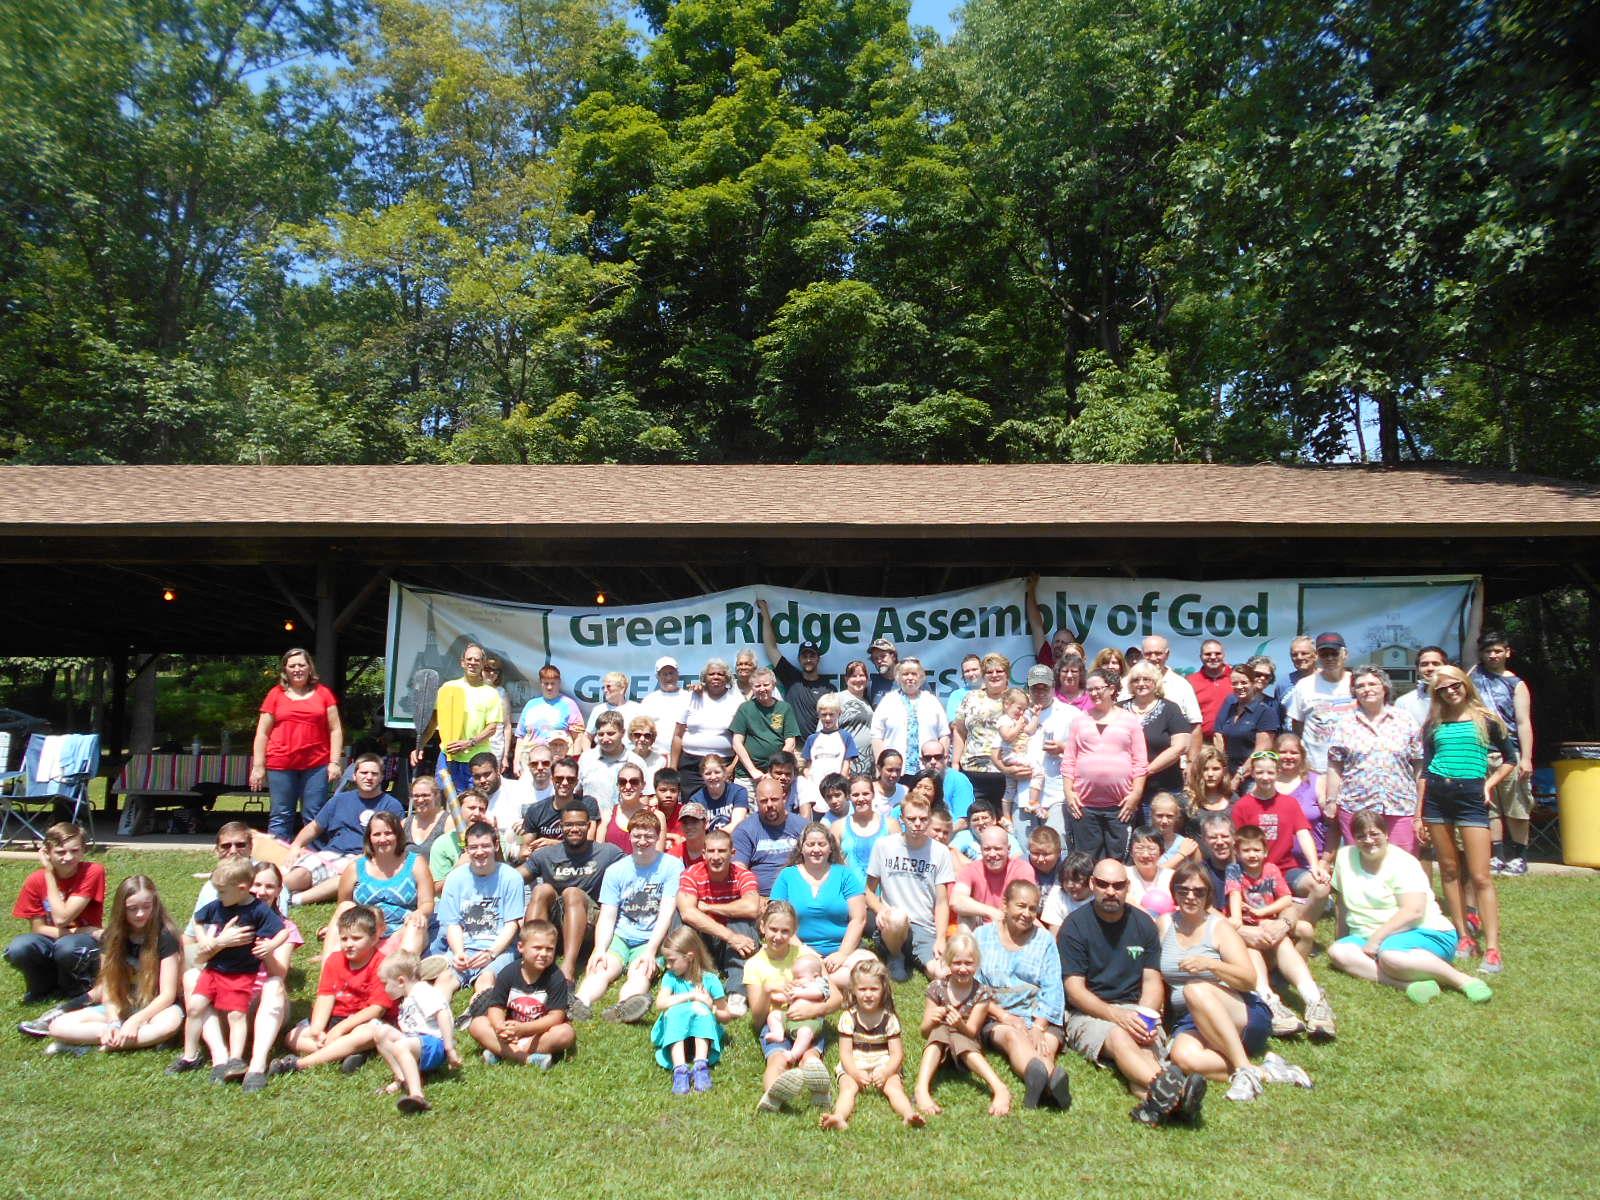 Green Ridge Assembly Of God image 4